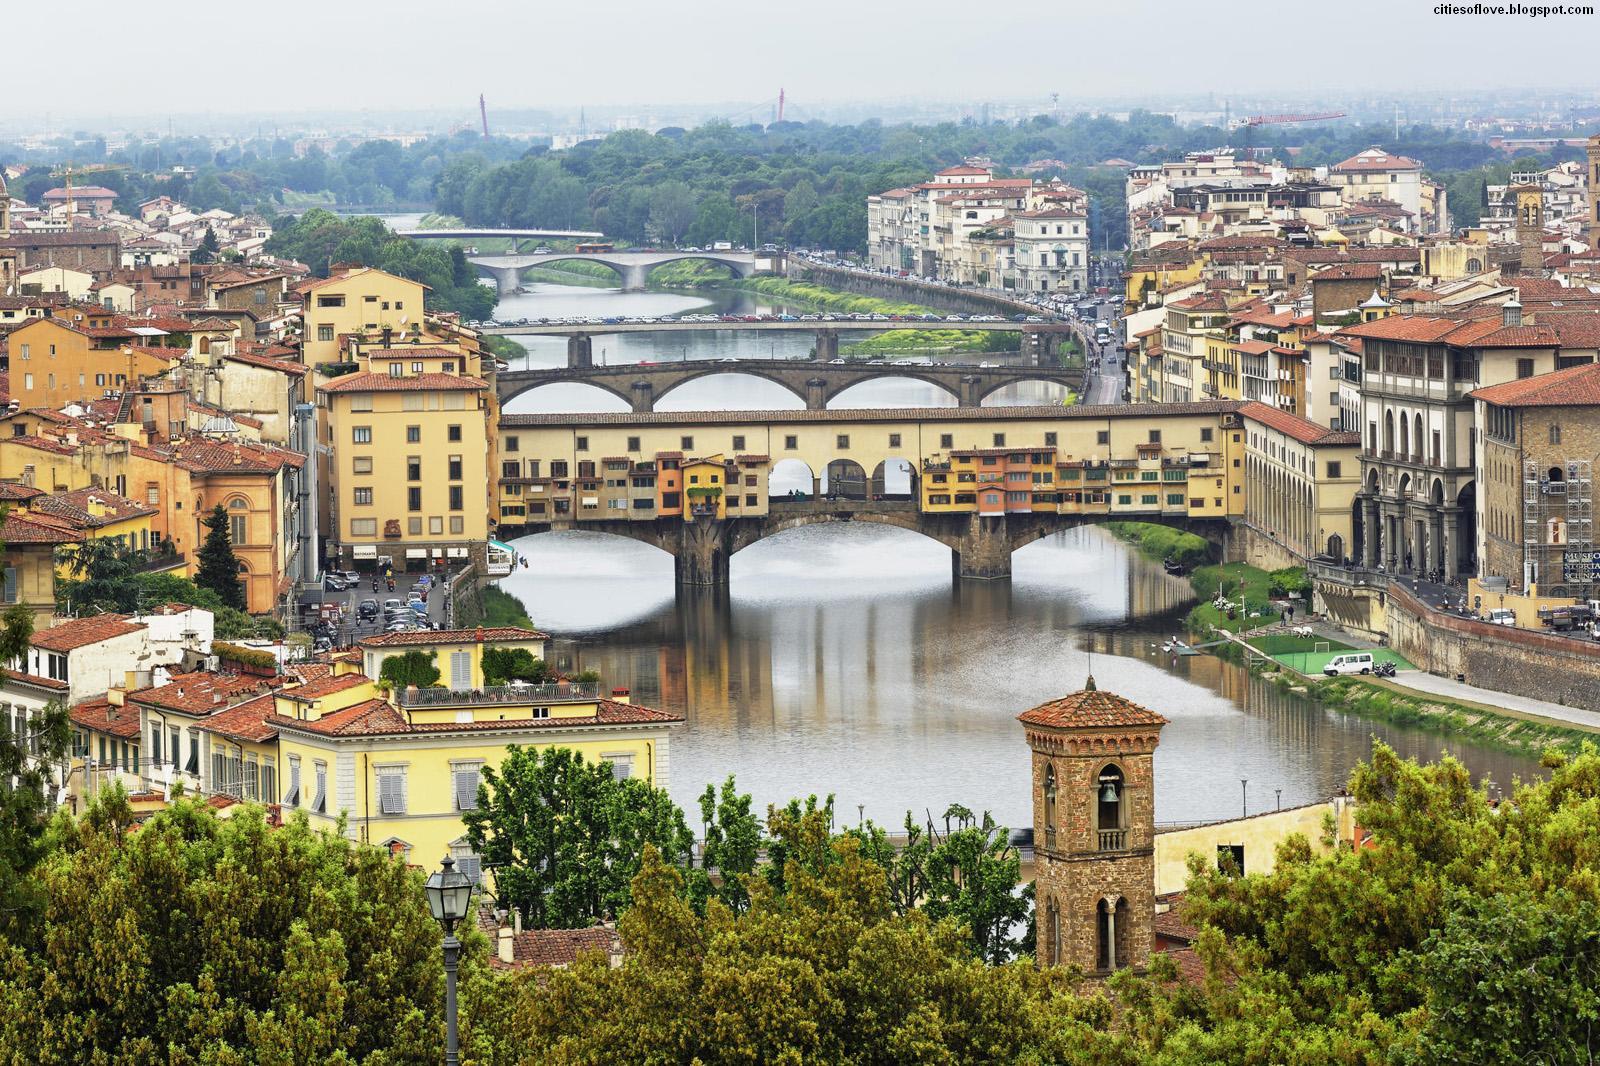 Beautiful Italian Old Bridge Arno River Italy Hd Desktop Wallpaper 1600x1066